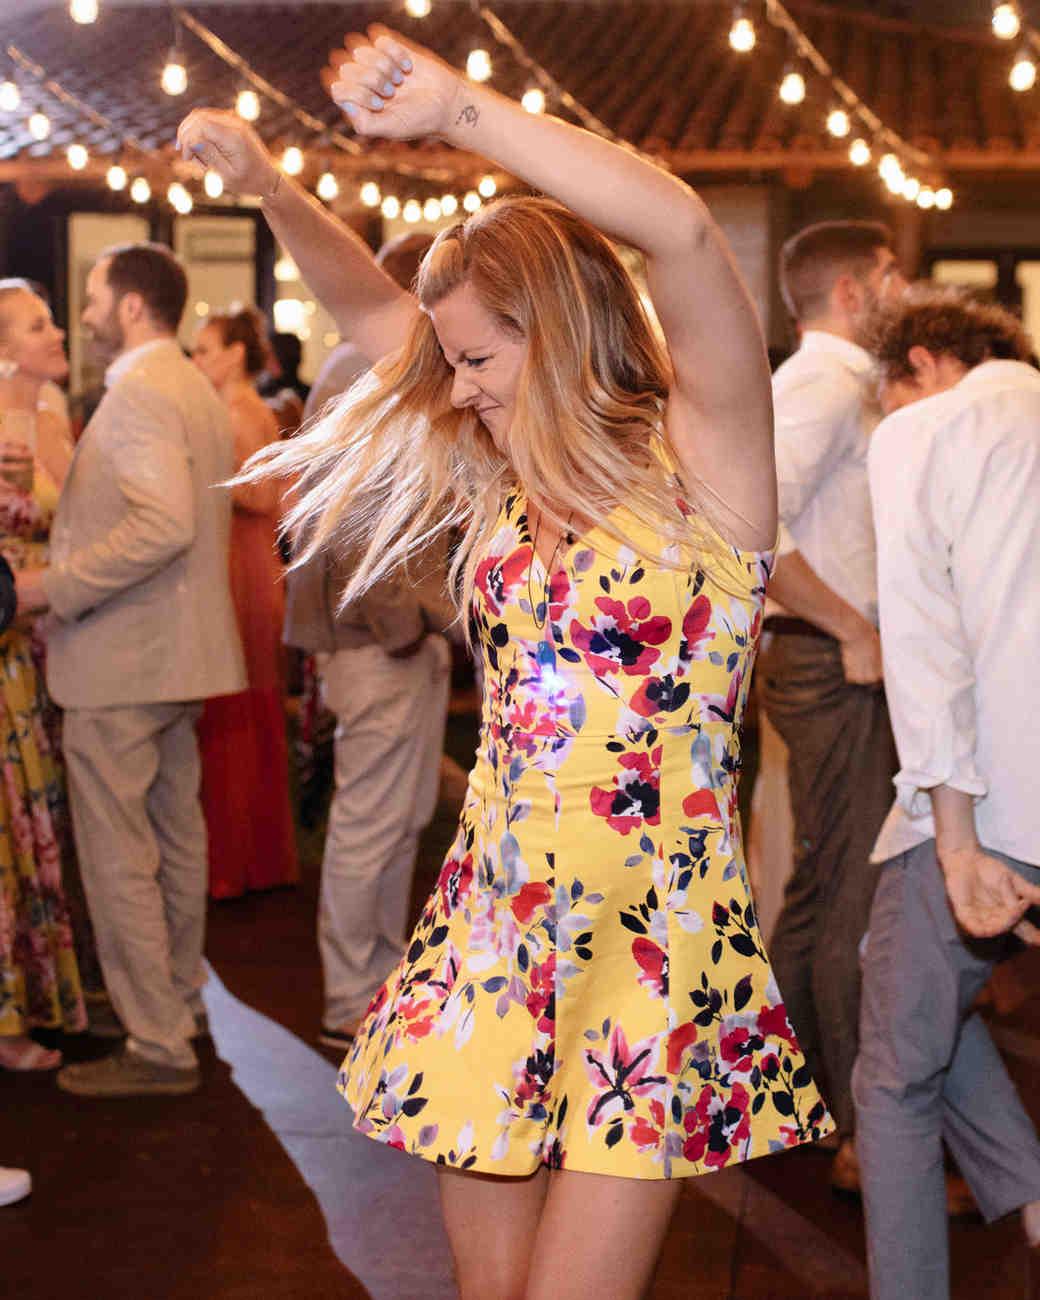 ariel trevor wedding tulum mexico dancing hard